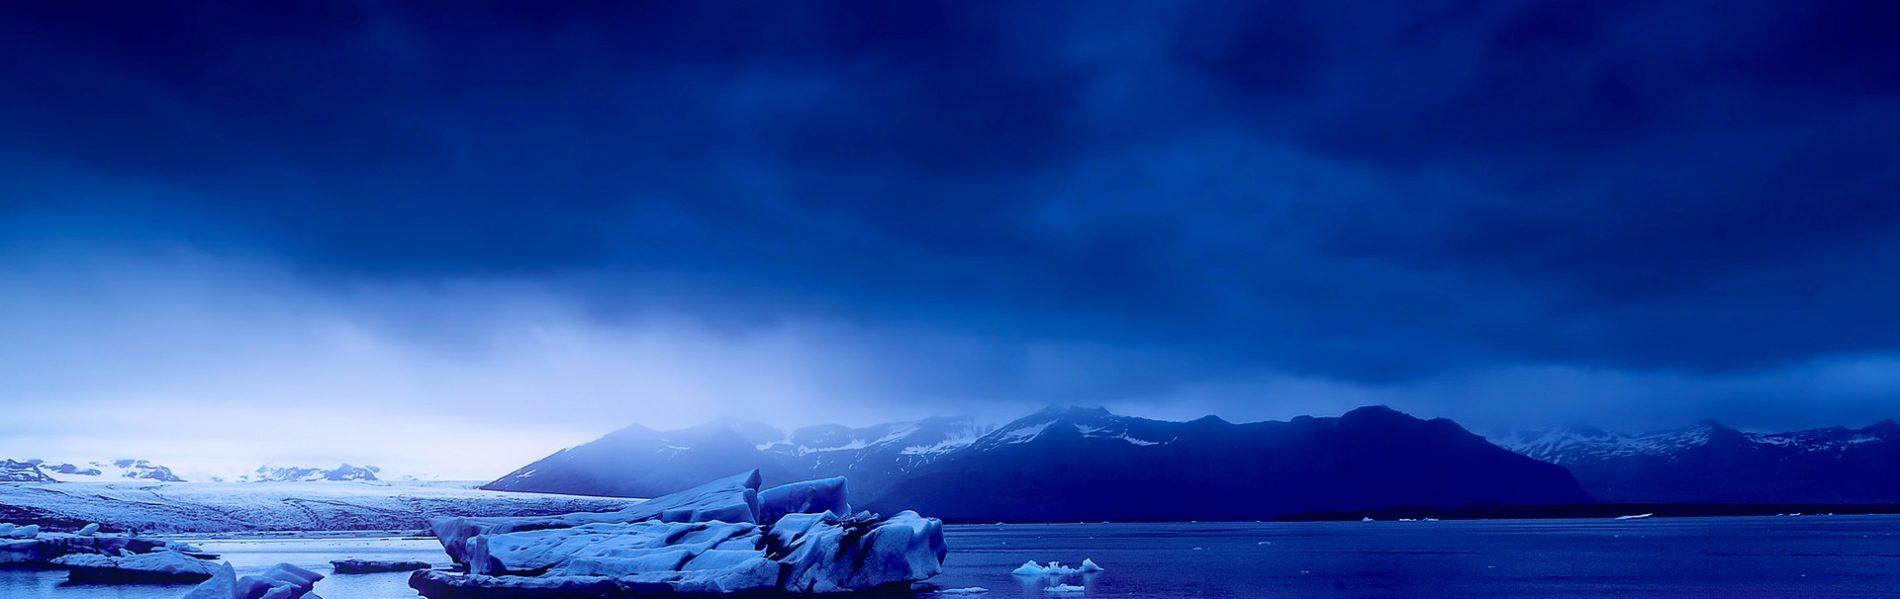 cropped-iceland-1950869_1920-3.jpg